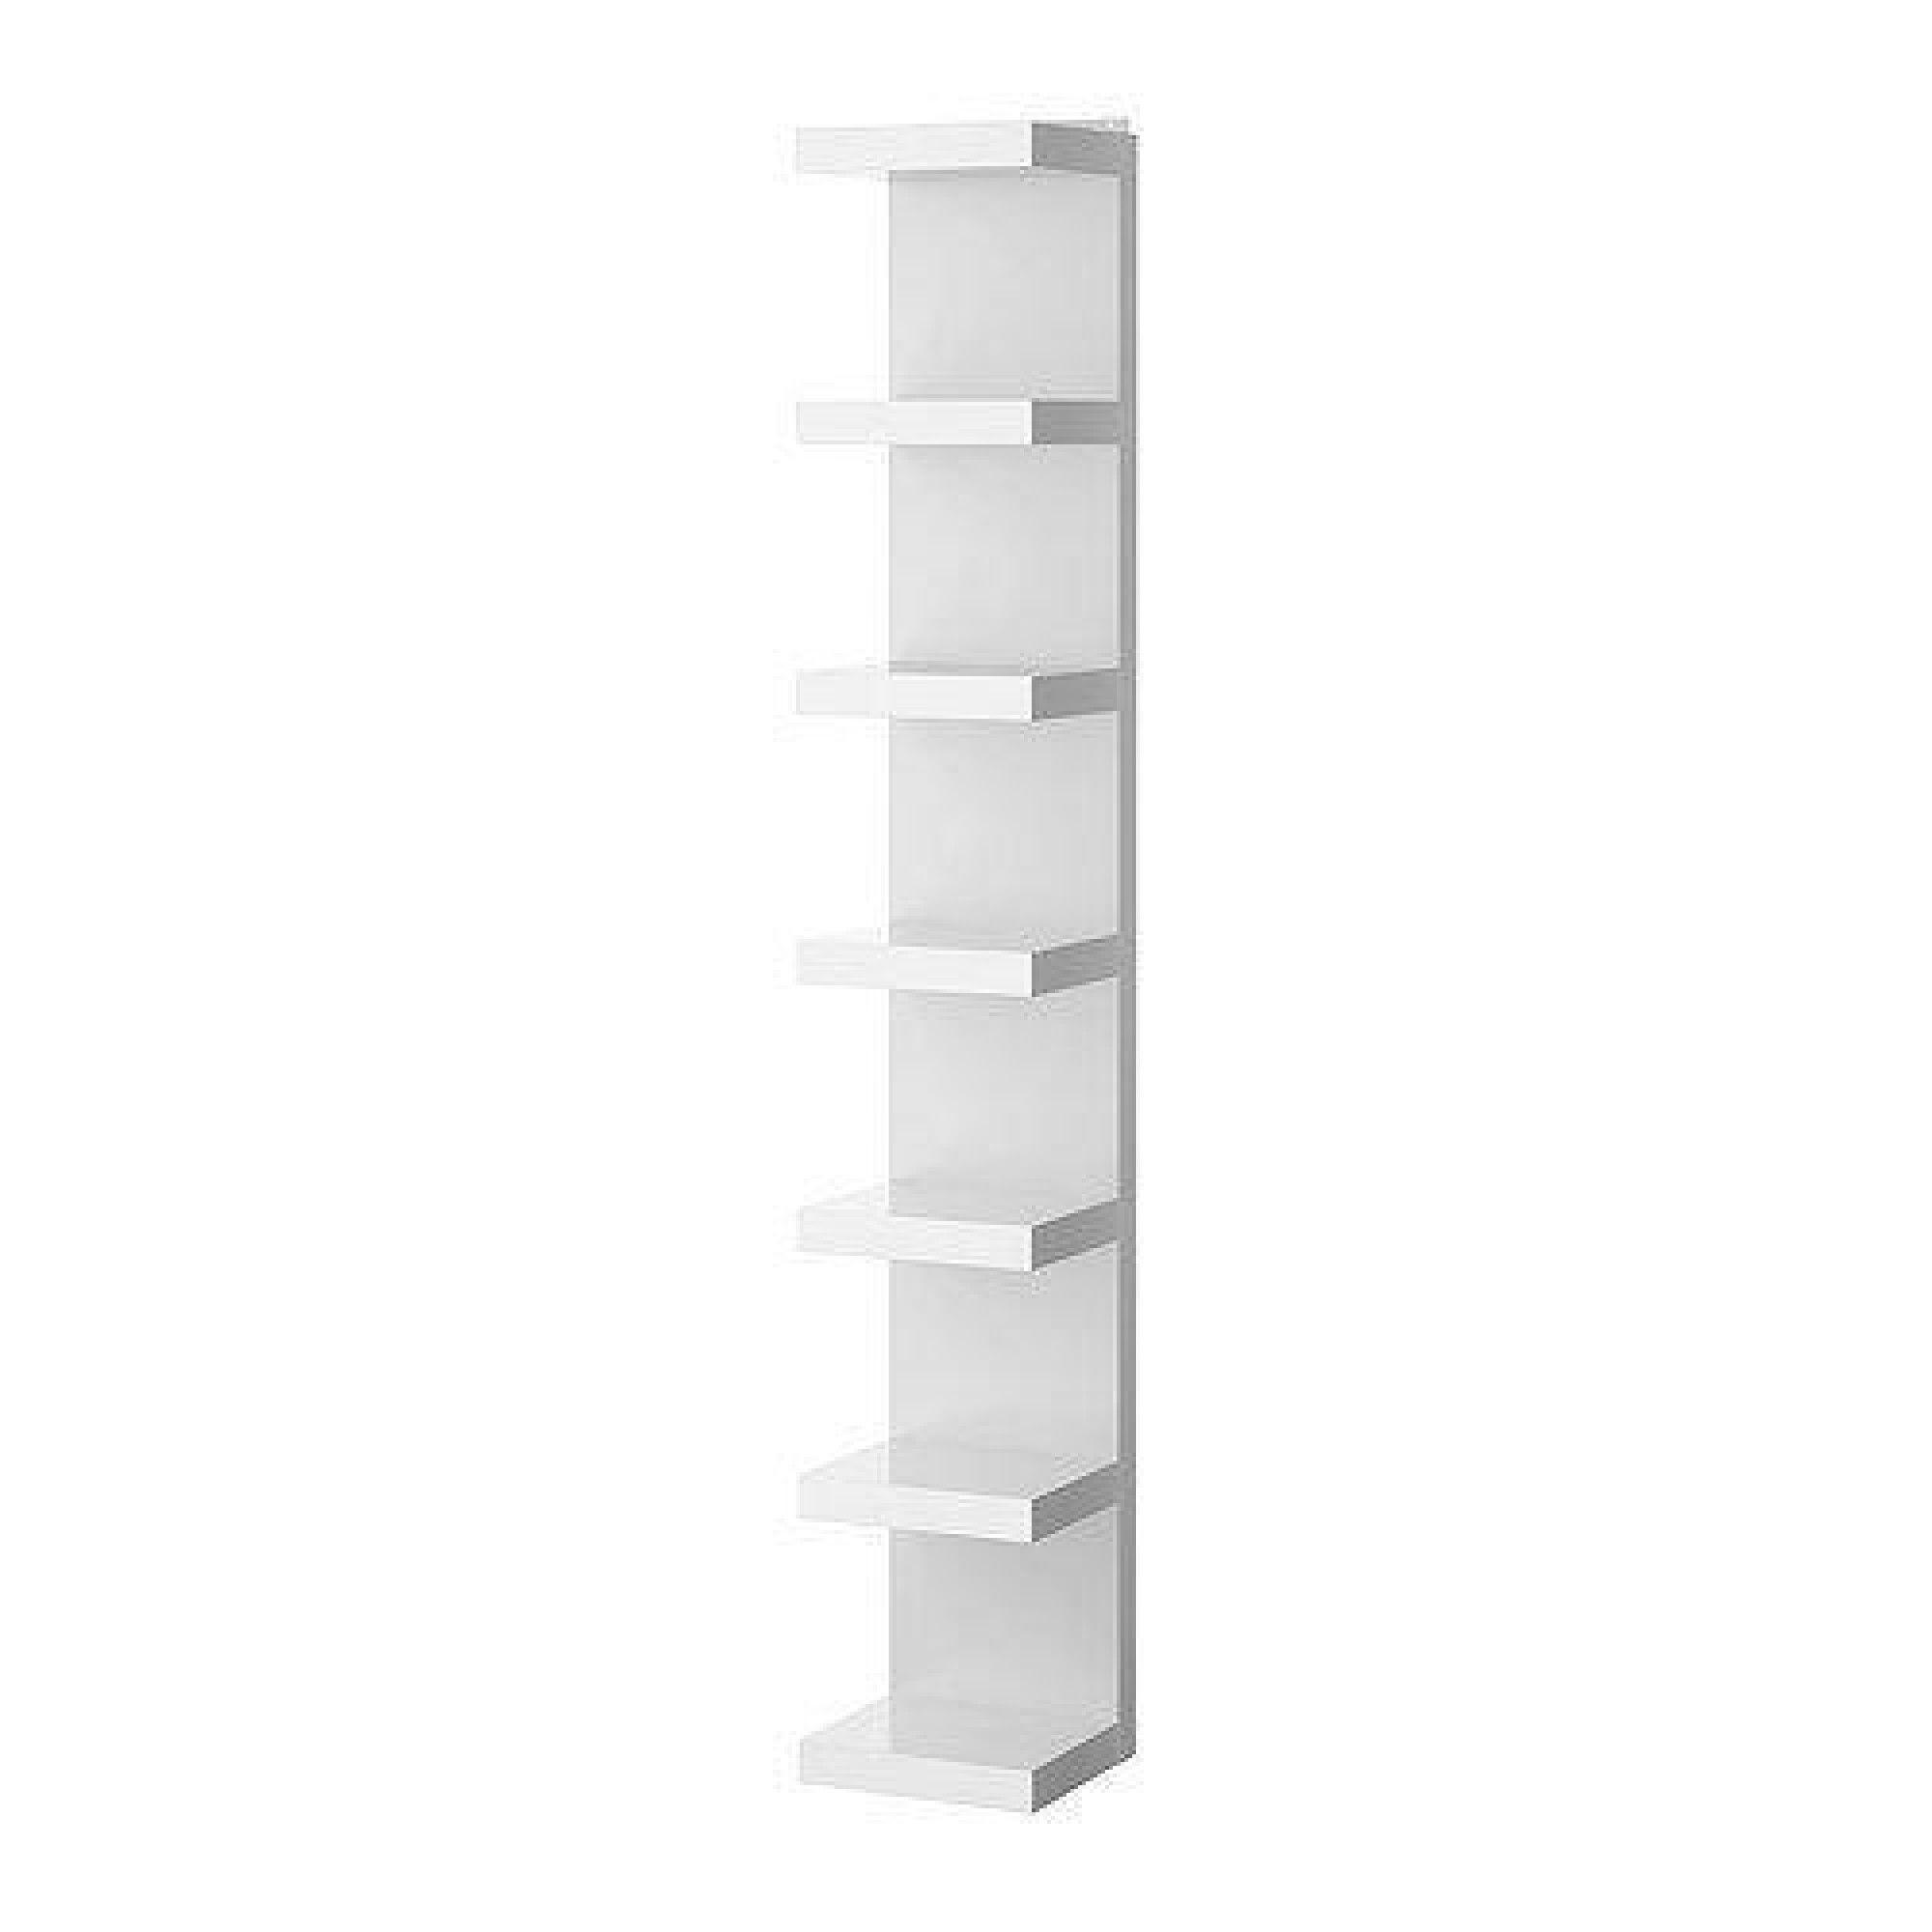 Ikea 602 821 86 New Lack Wall Shelf Unit White In 2020 Ikea Lack Wall Shelf Wall Shelf Unit Ikea Lack Shelves